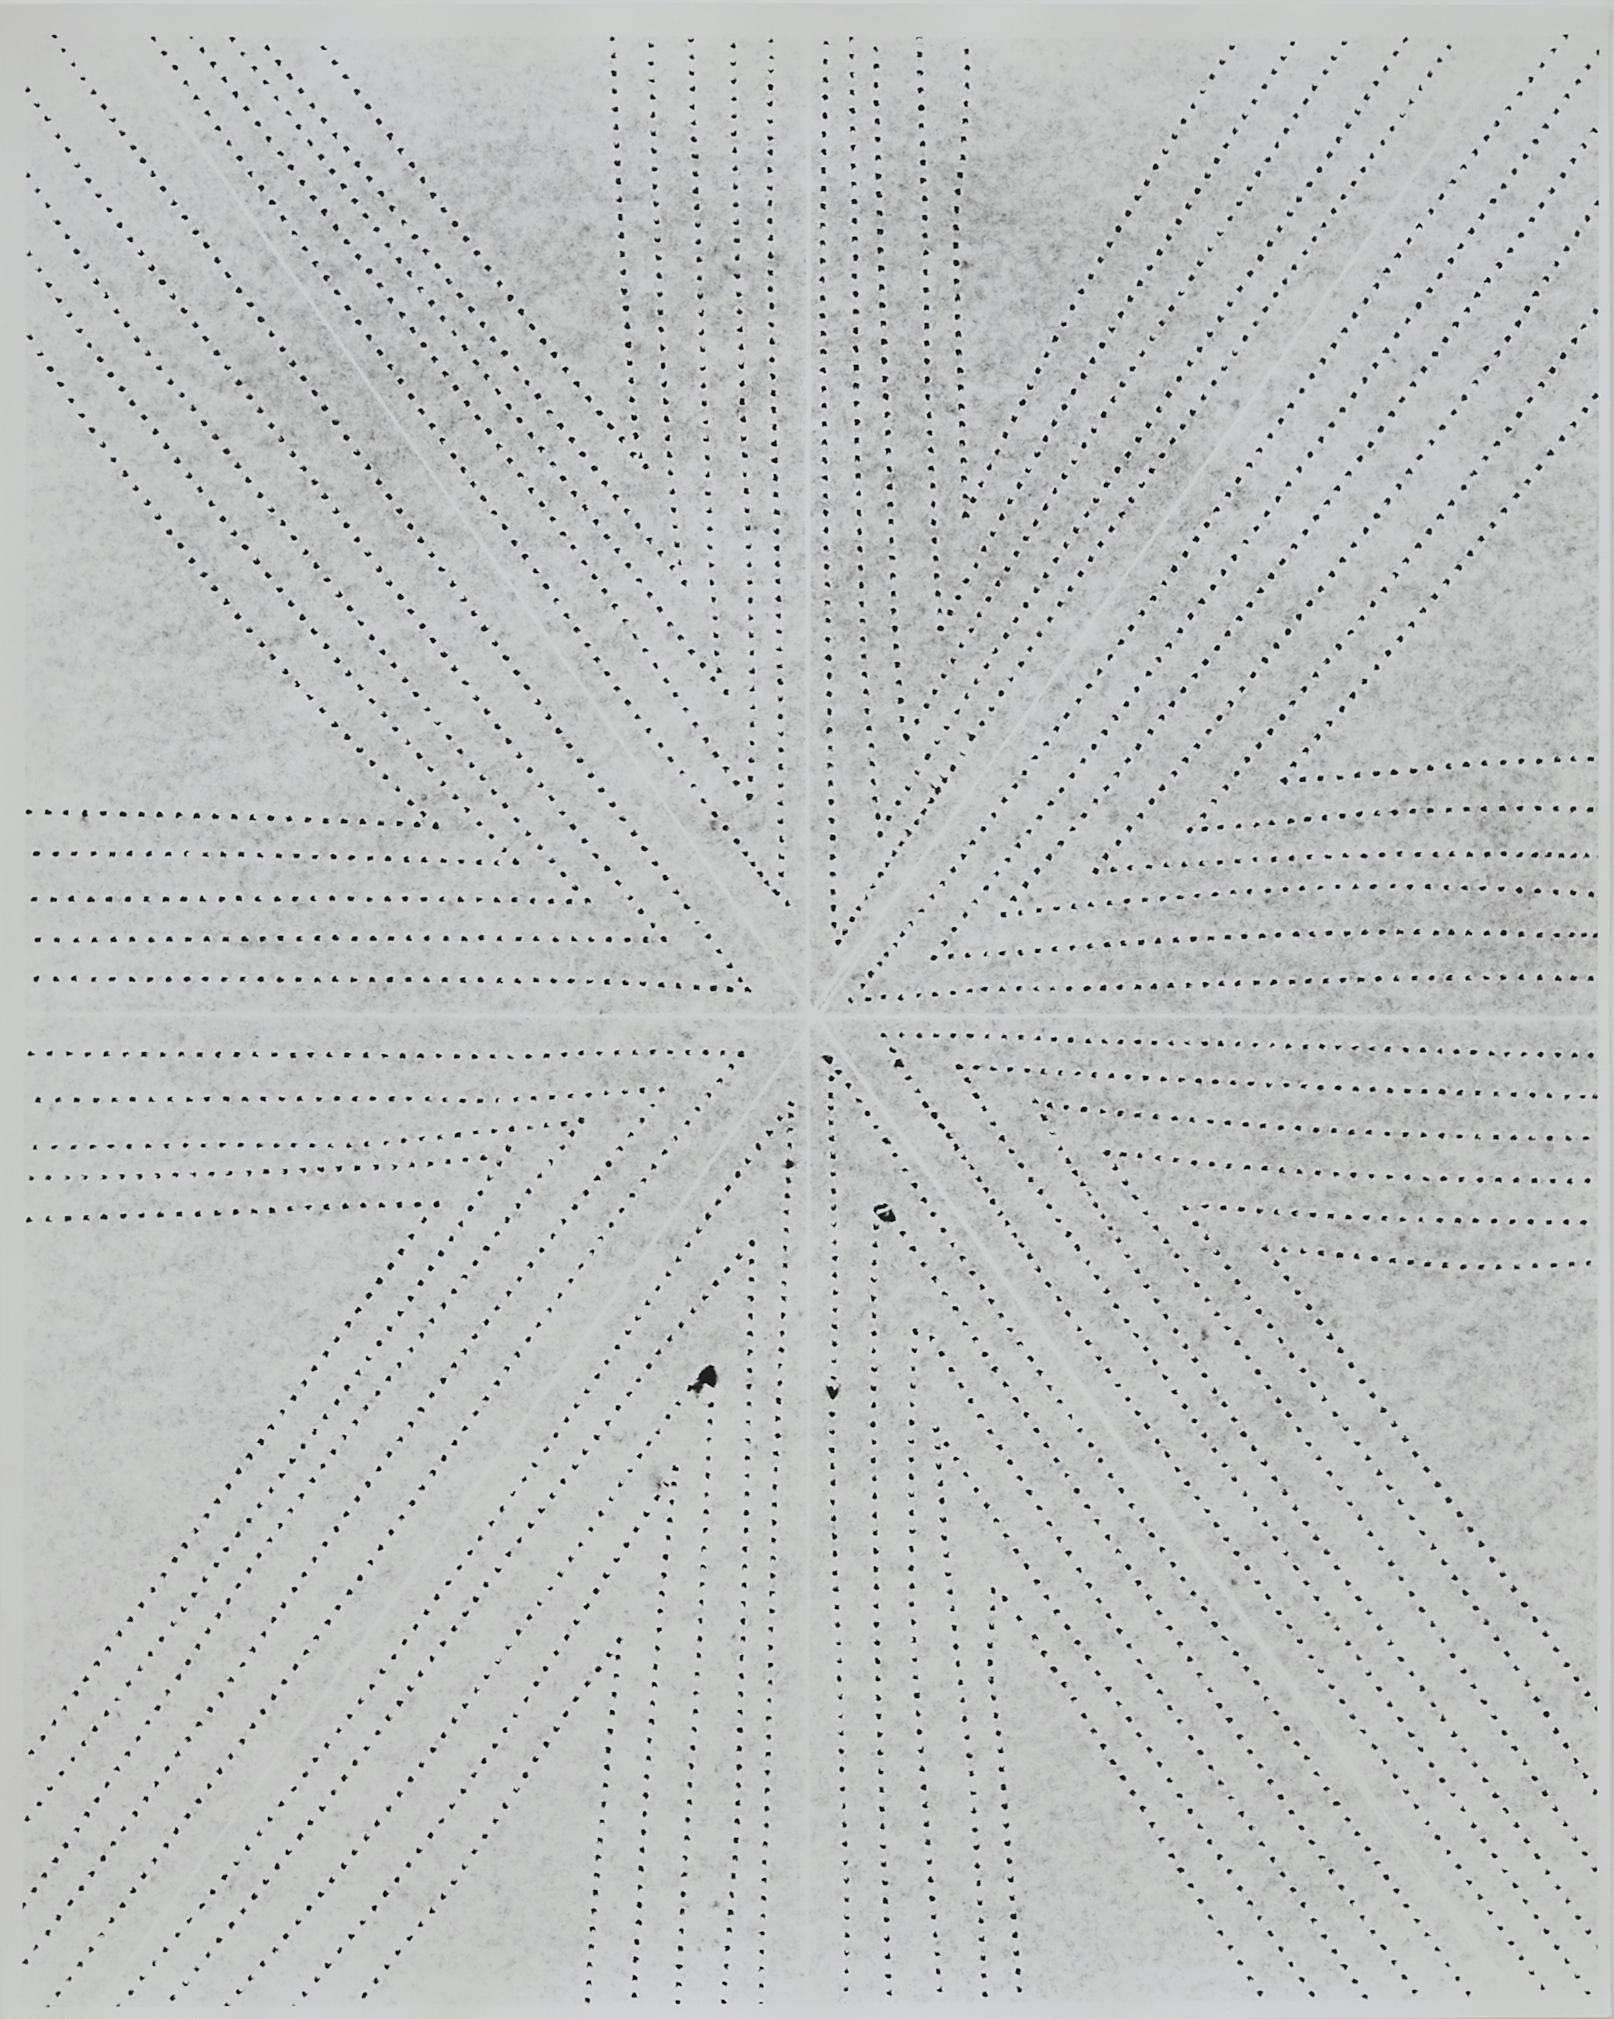 Practice Piece (Sewing Excerise #5W), 2019, Silver gelantin print, 53 x 40cm